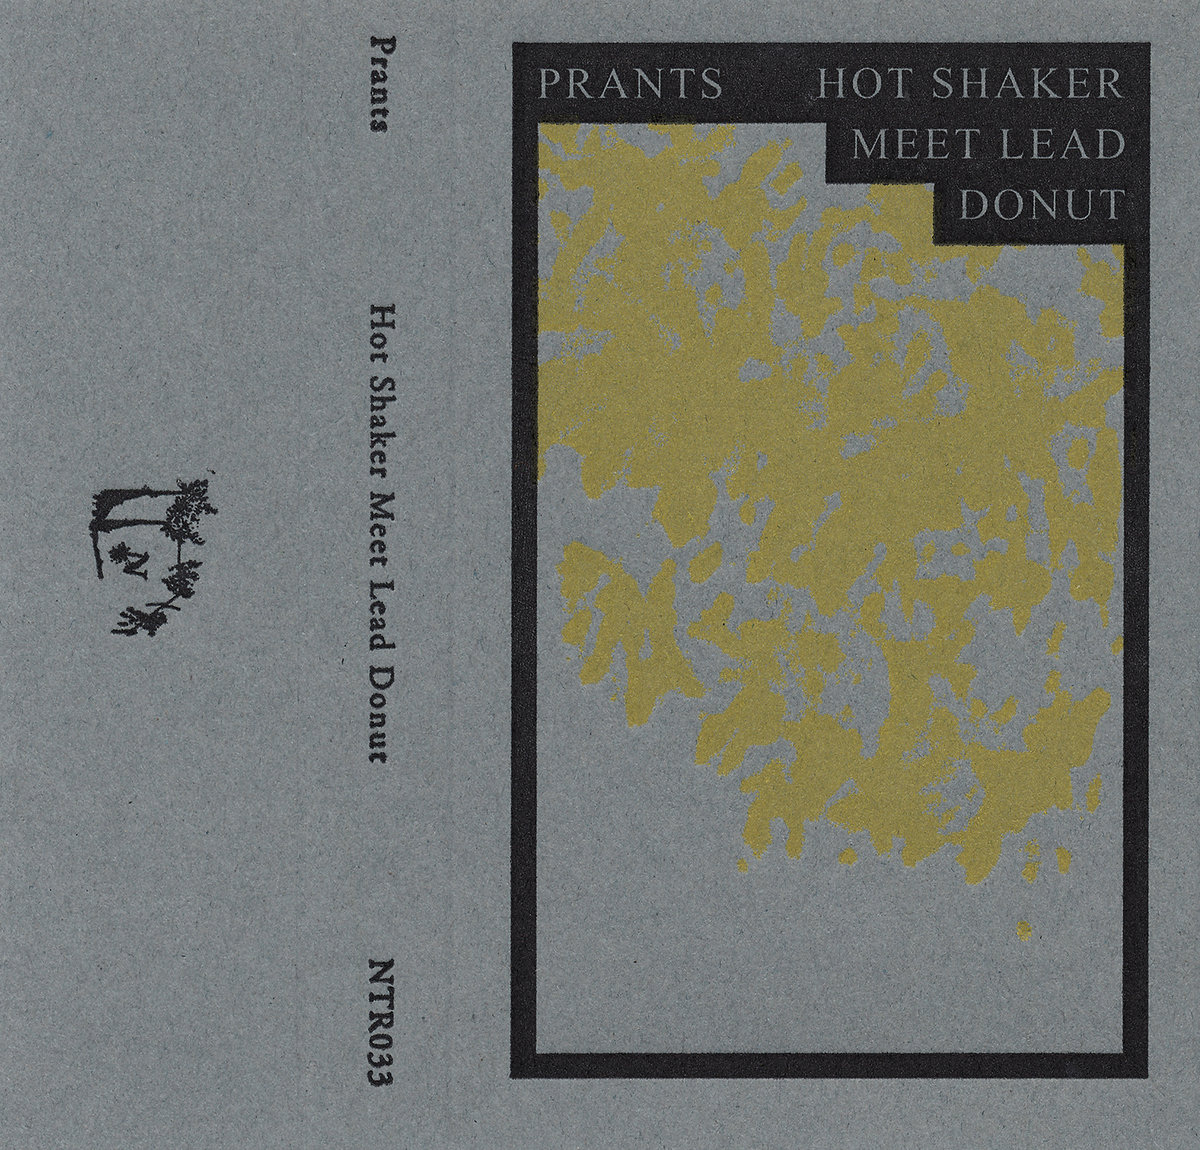 Prants Hot Shaker Meet Lead Donut